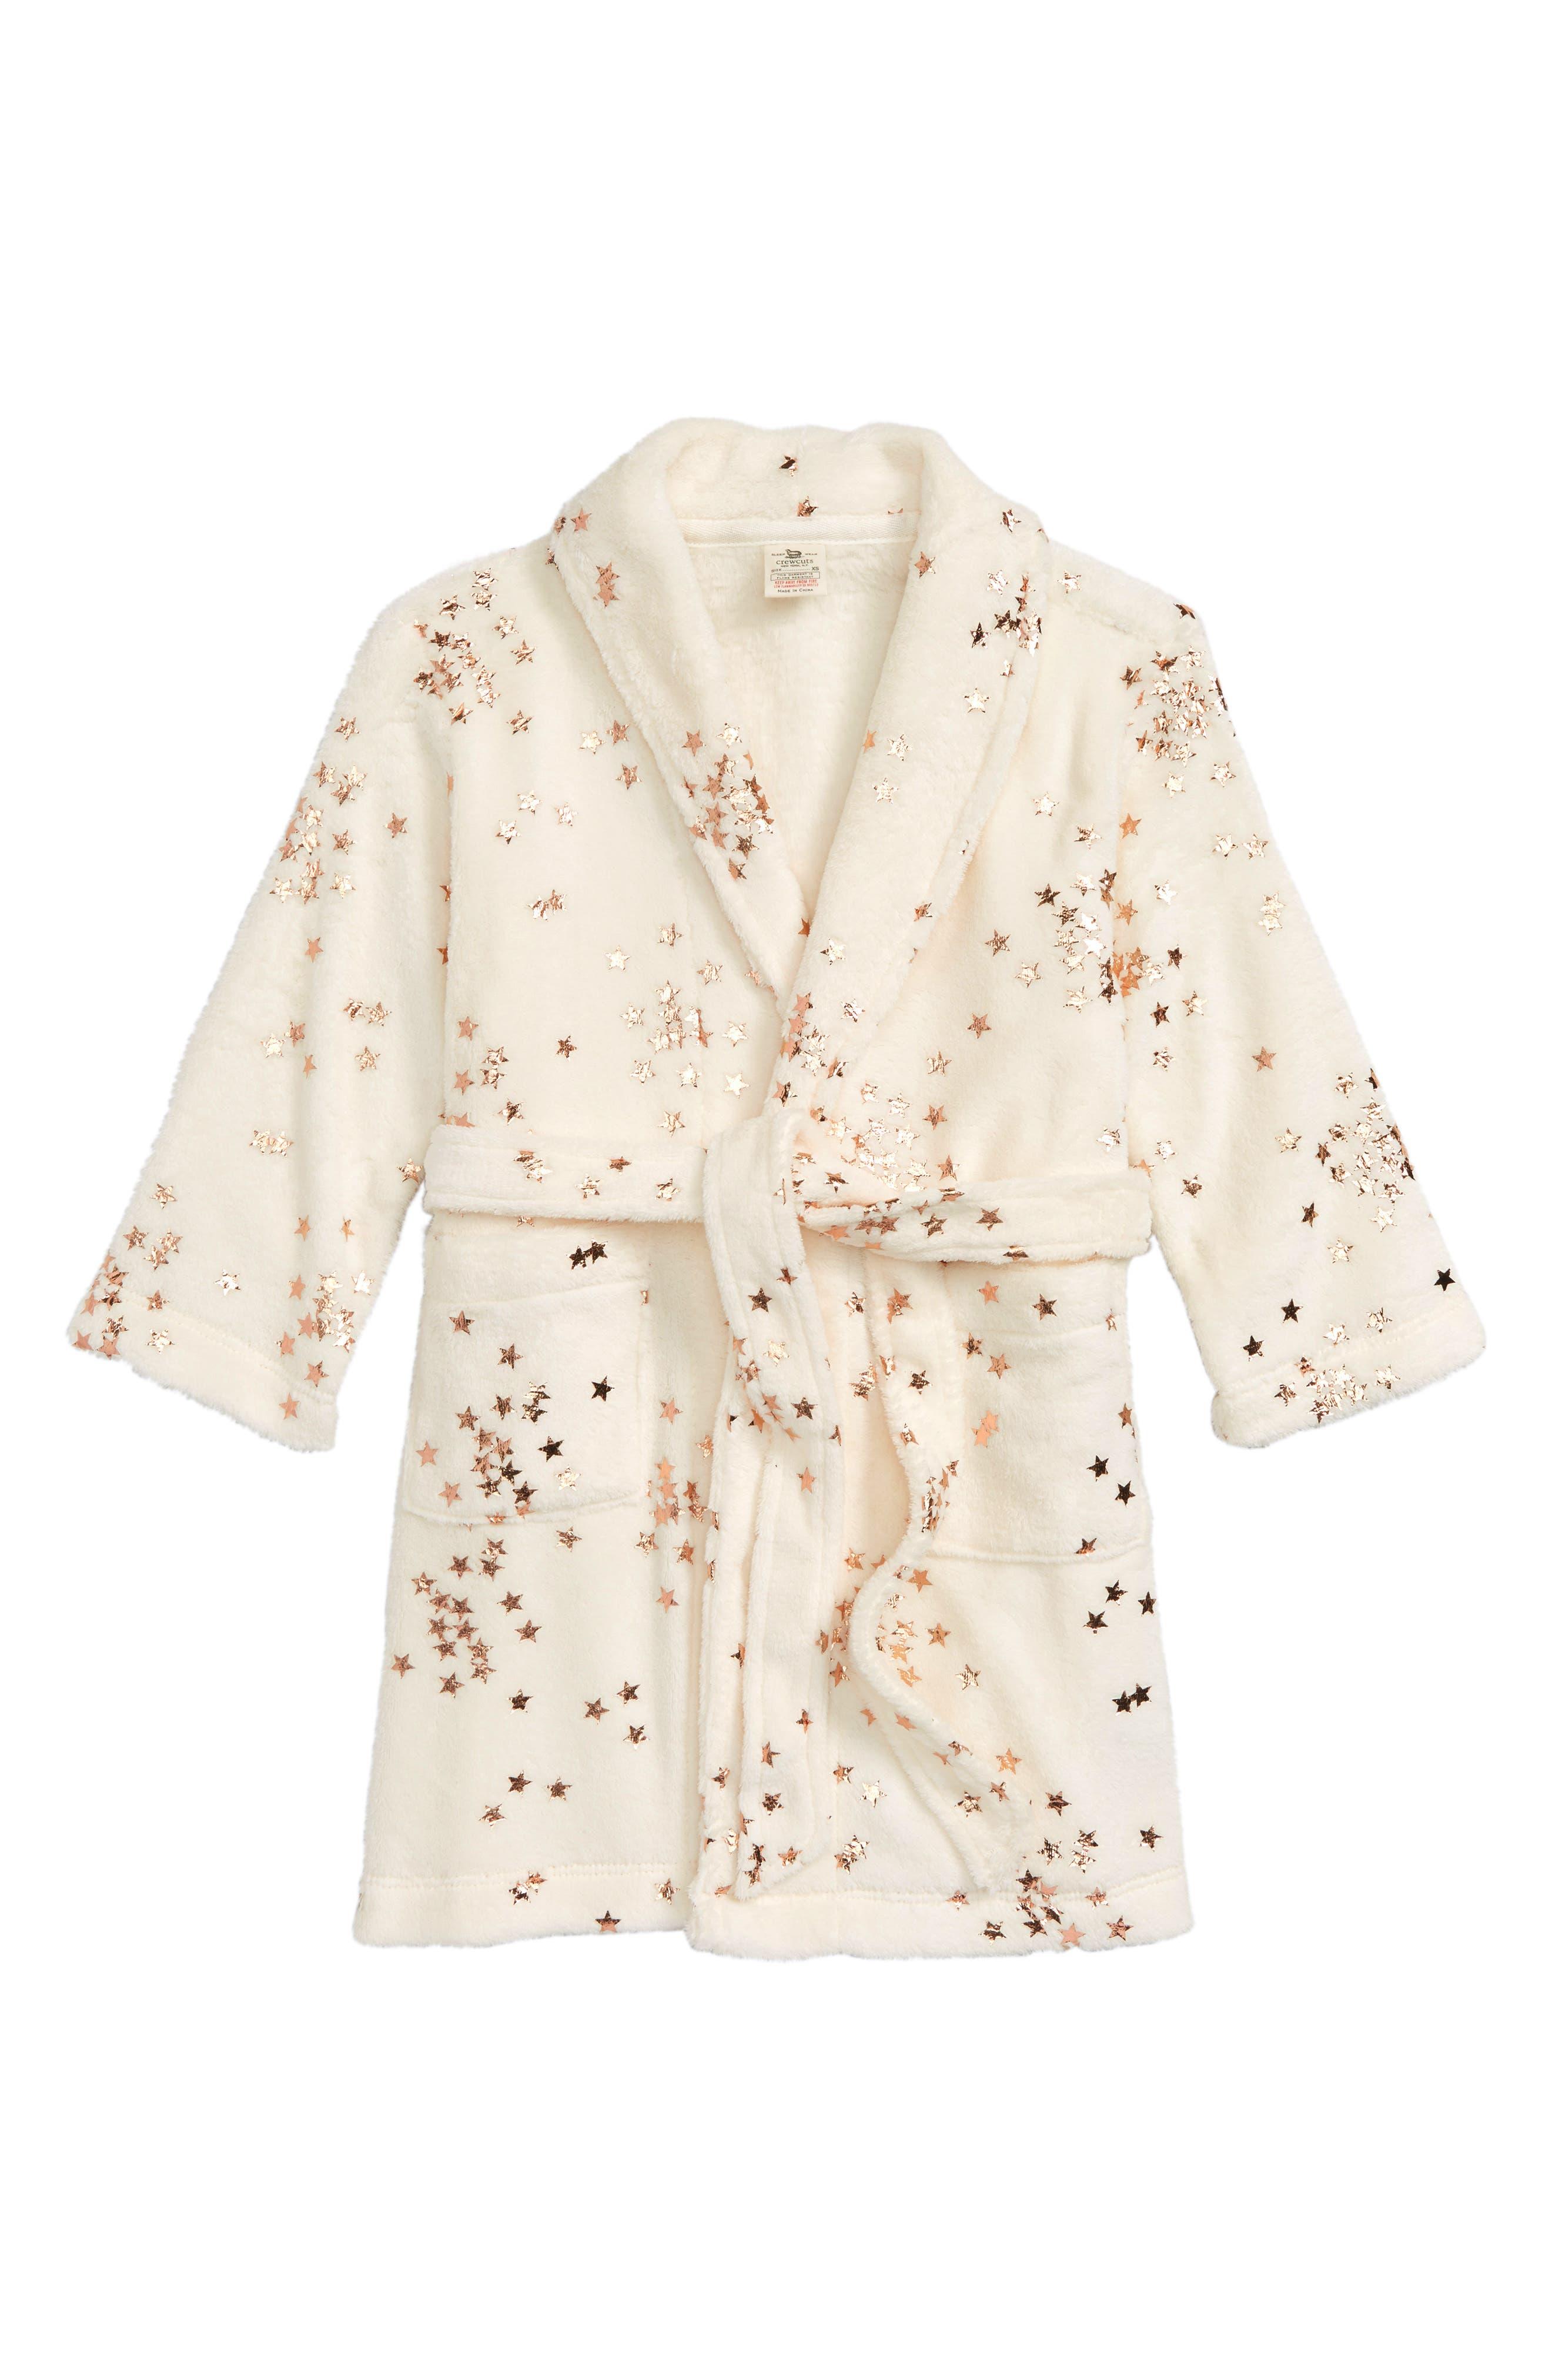 Star Fleece Robe,                             Main thumbnail 1, color,                             IVORY ROSE GOLD